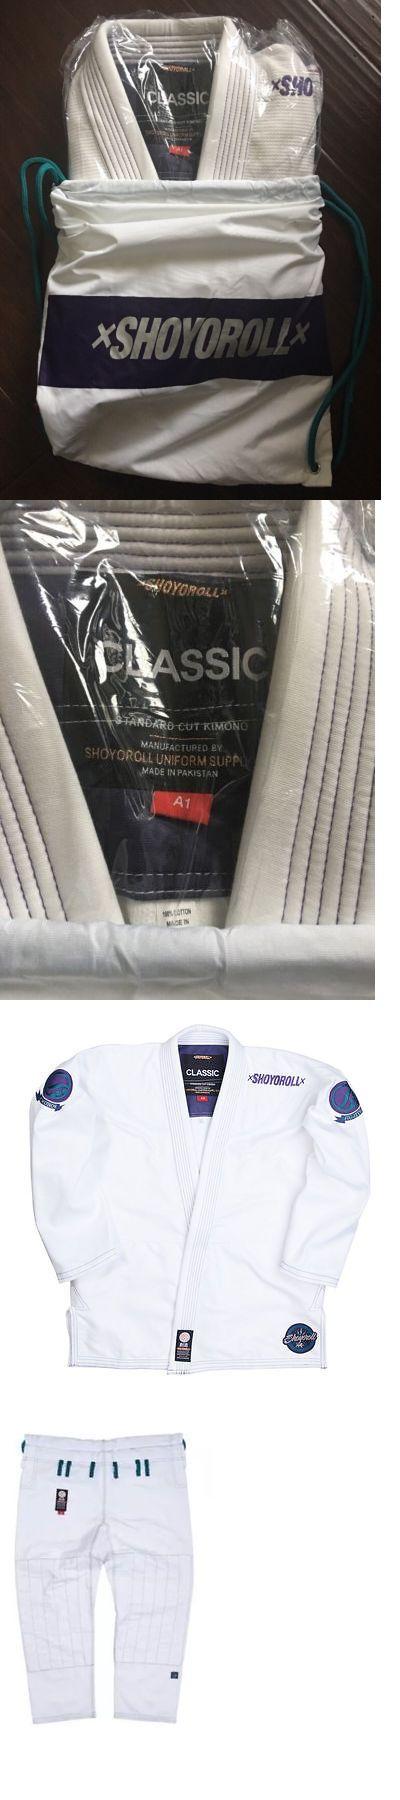 Other Combat Sport Clothing 73988: Shoyoroll Comp Xv Winter White A1 ***Bnib*** Bjj Kimono -> BUY IT NOW ONLY: $285 on eBay!